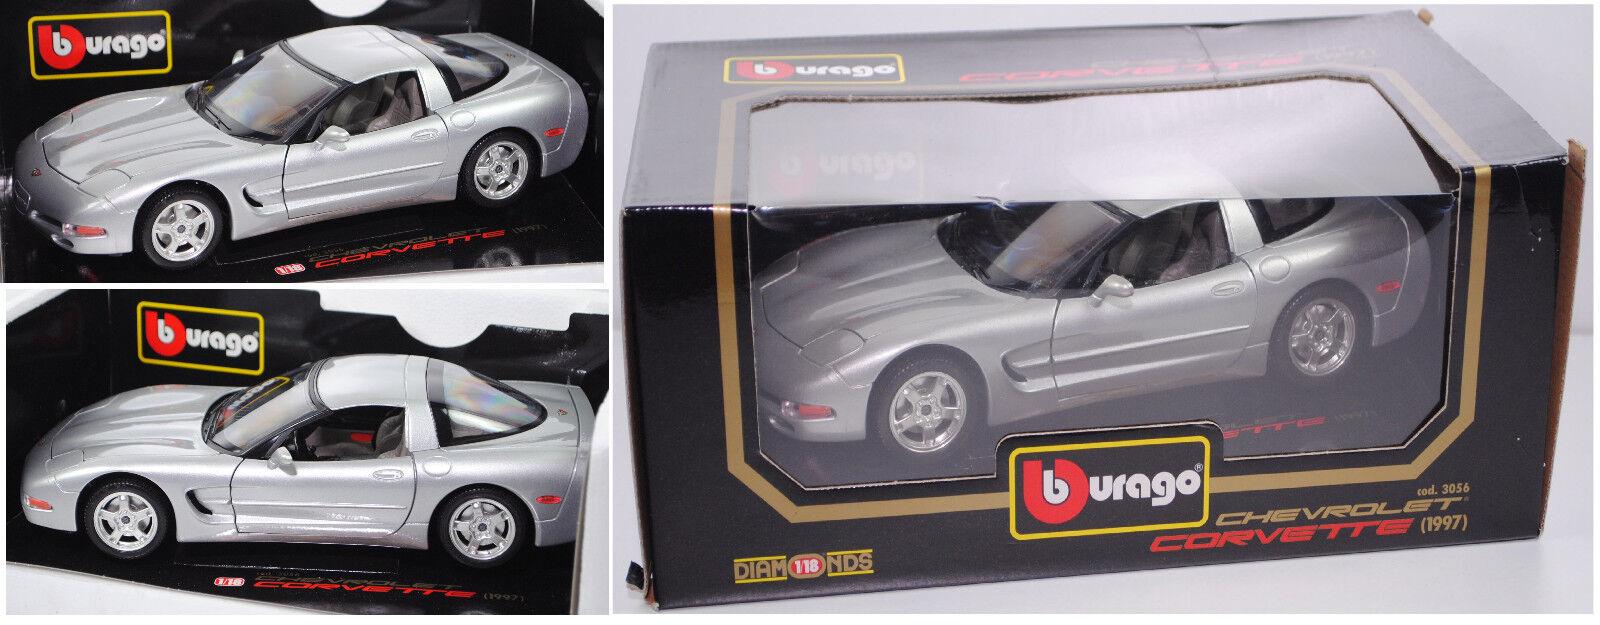 Bburago 3056 Chevrolet Corvette Coupé, silber, 1 18    Verrückter Preis, Birmingham